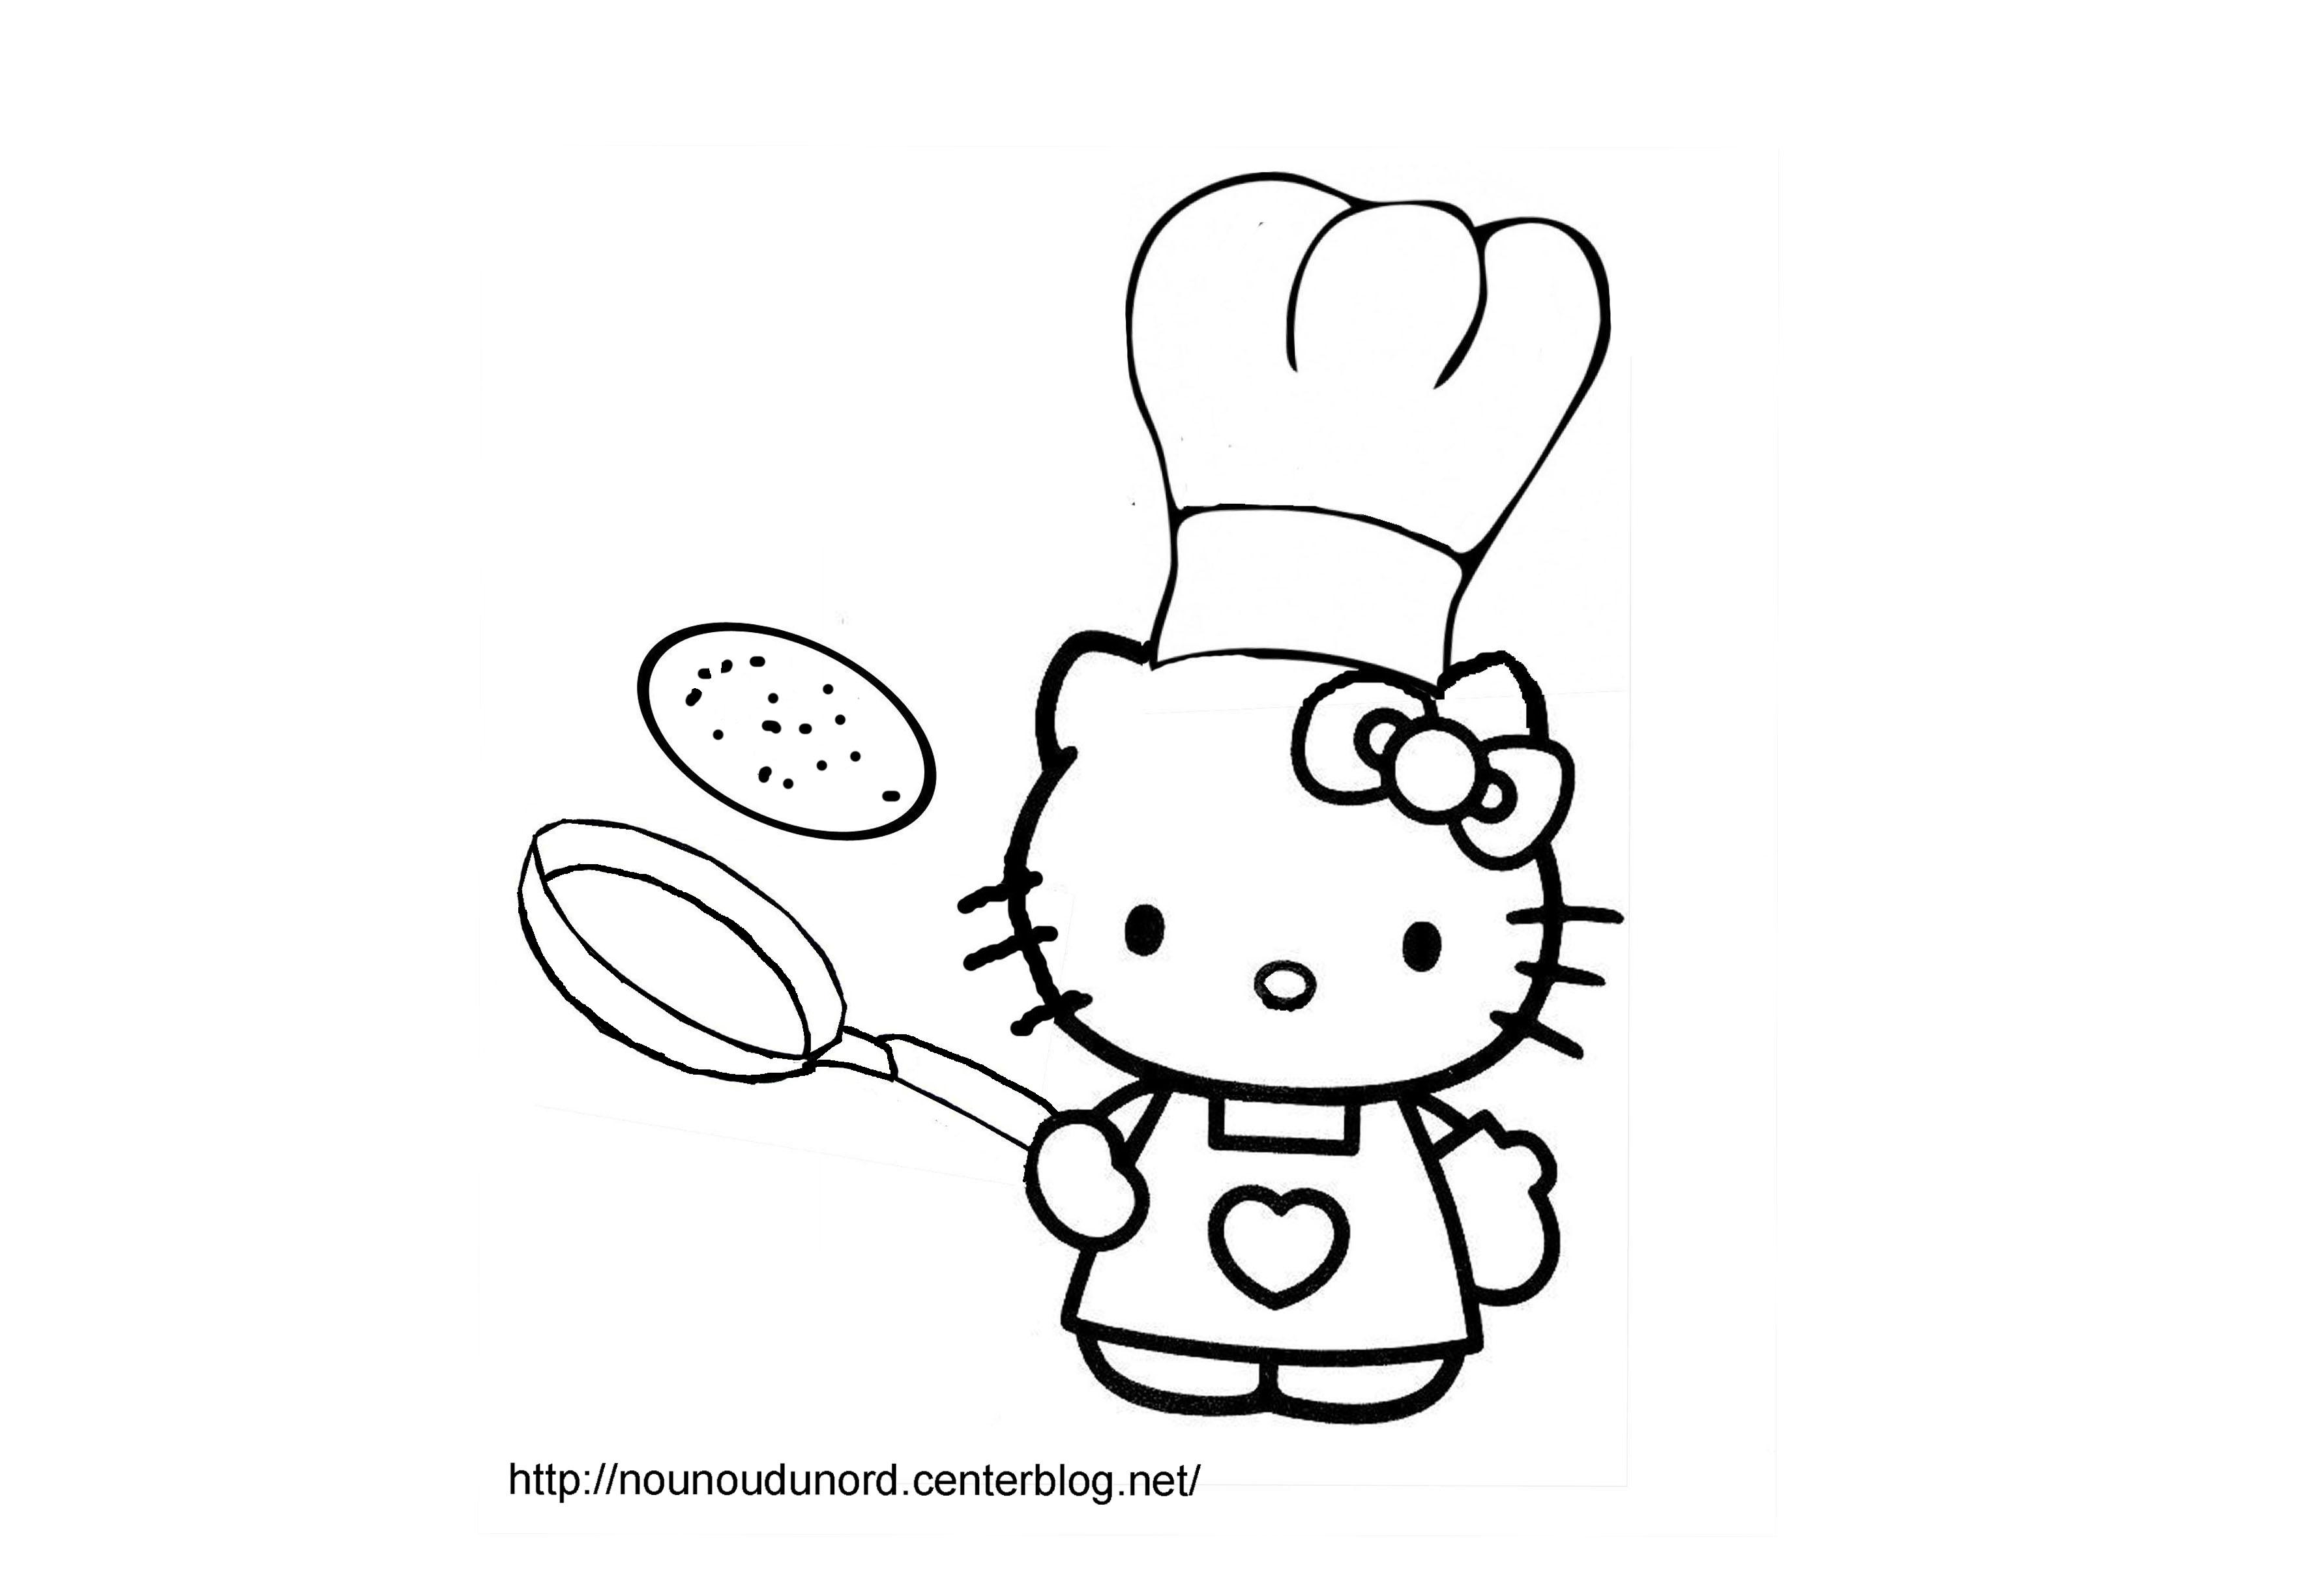 147 dibujos de Hello kitty para colorear | Oh Kids | Page 6